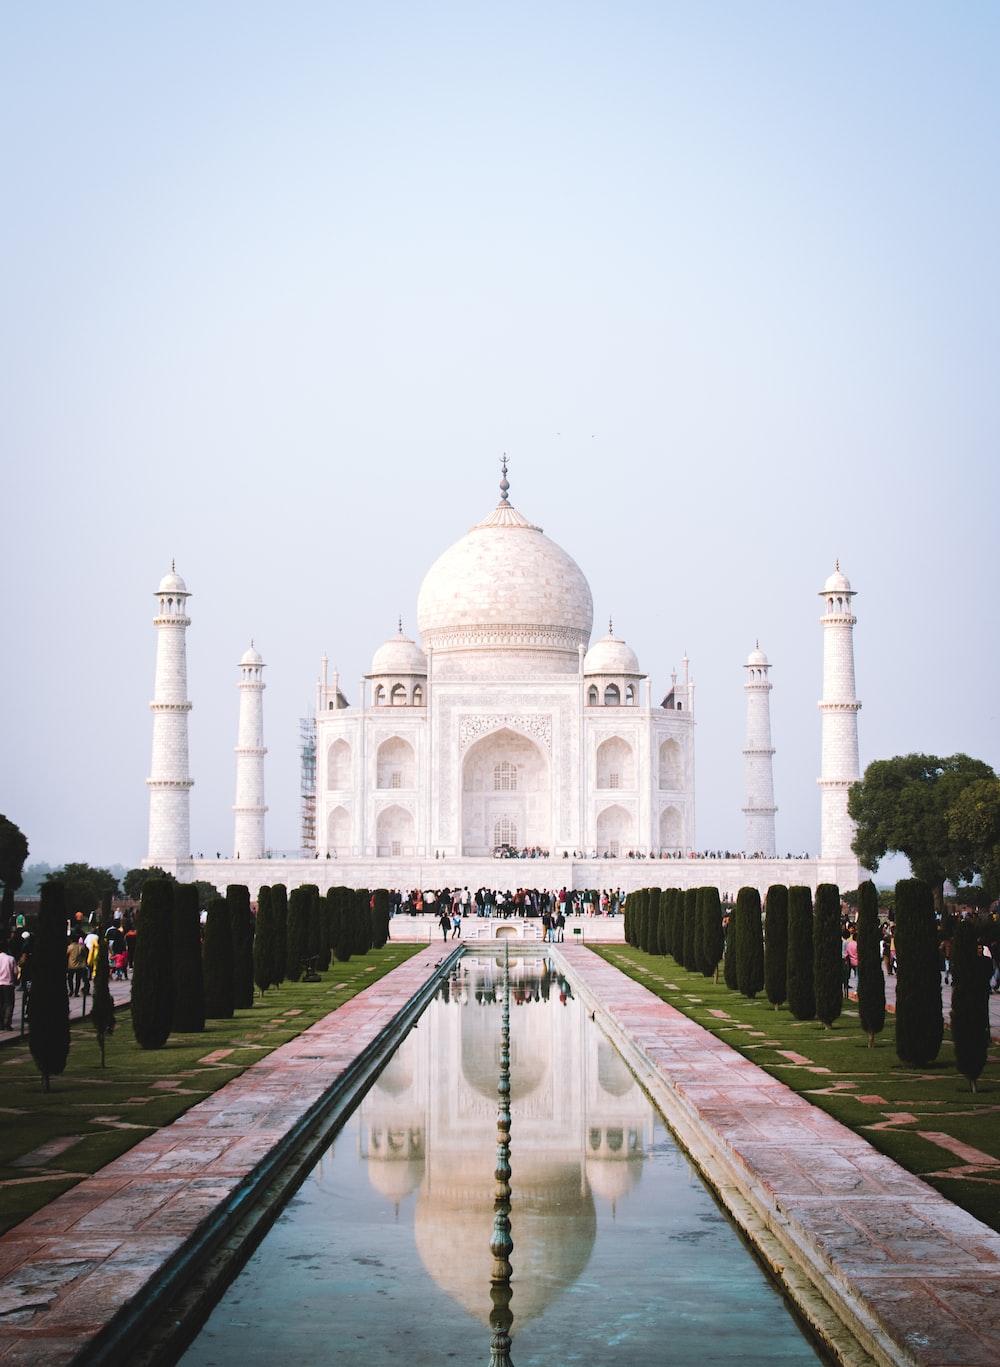 people at Taj Mahal, India